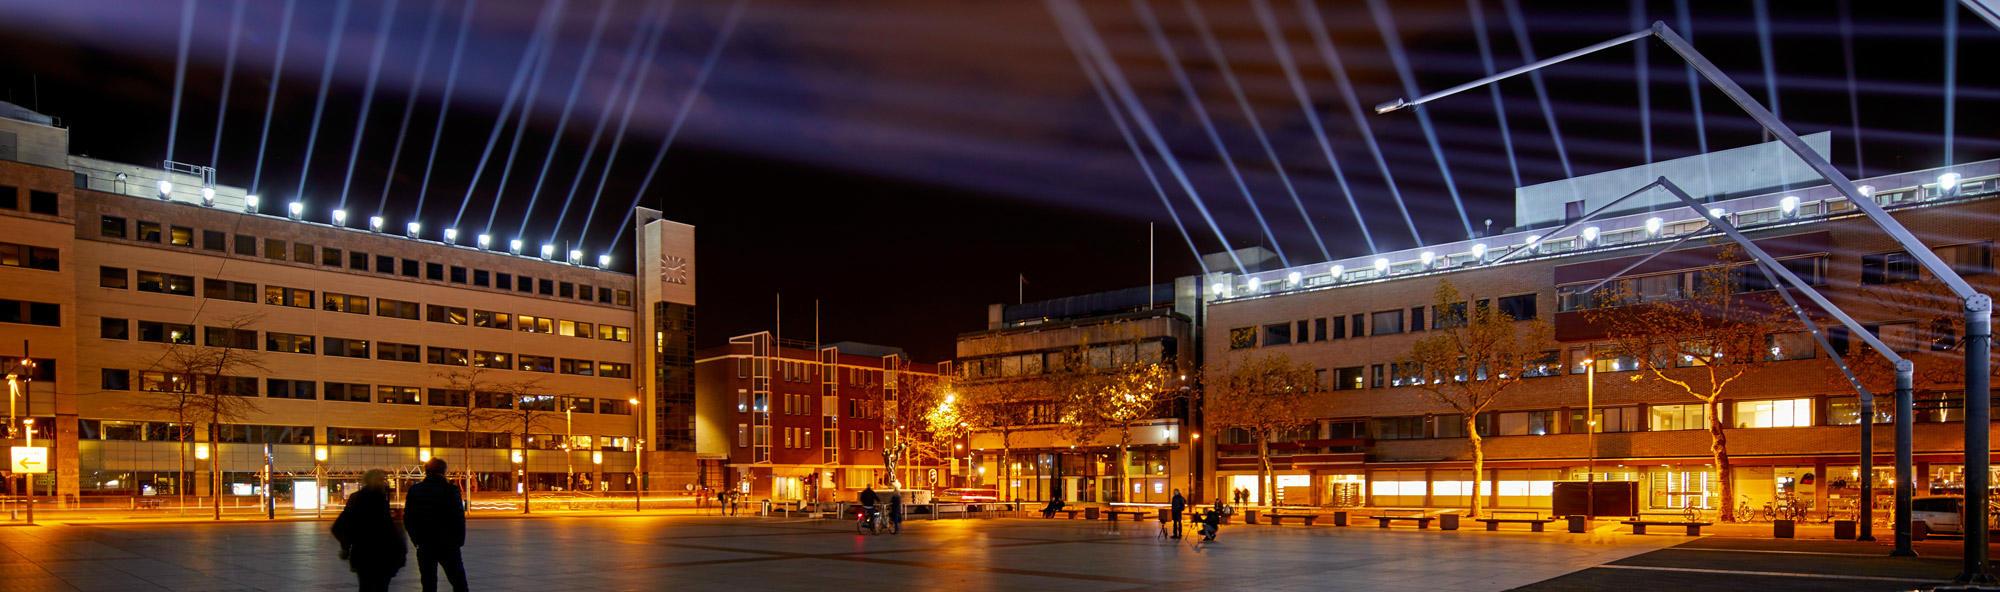 VLS GLOW 17 Image 1 – Photo credits: © Philips Lighting